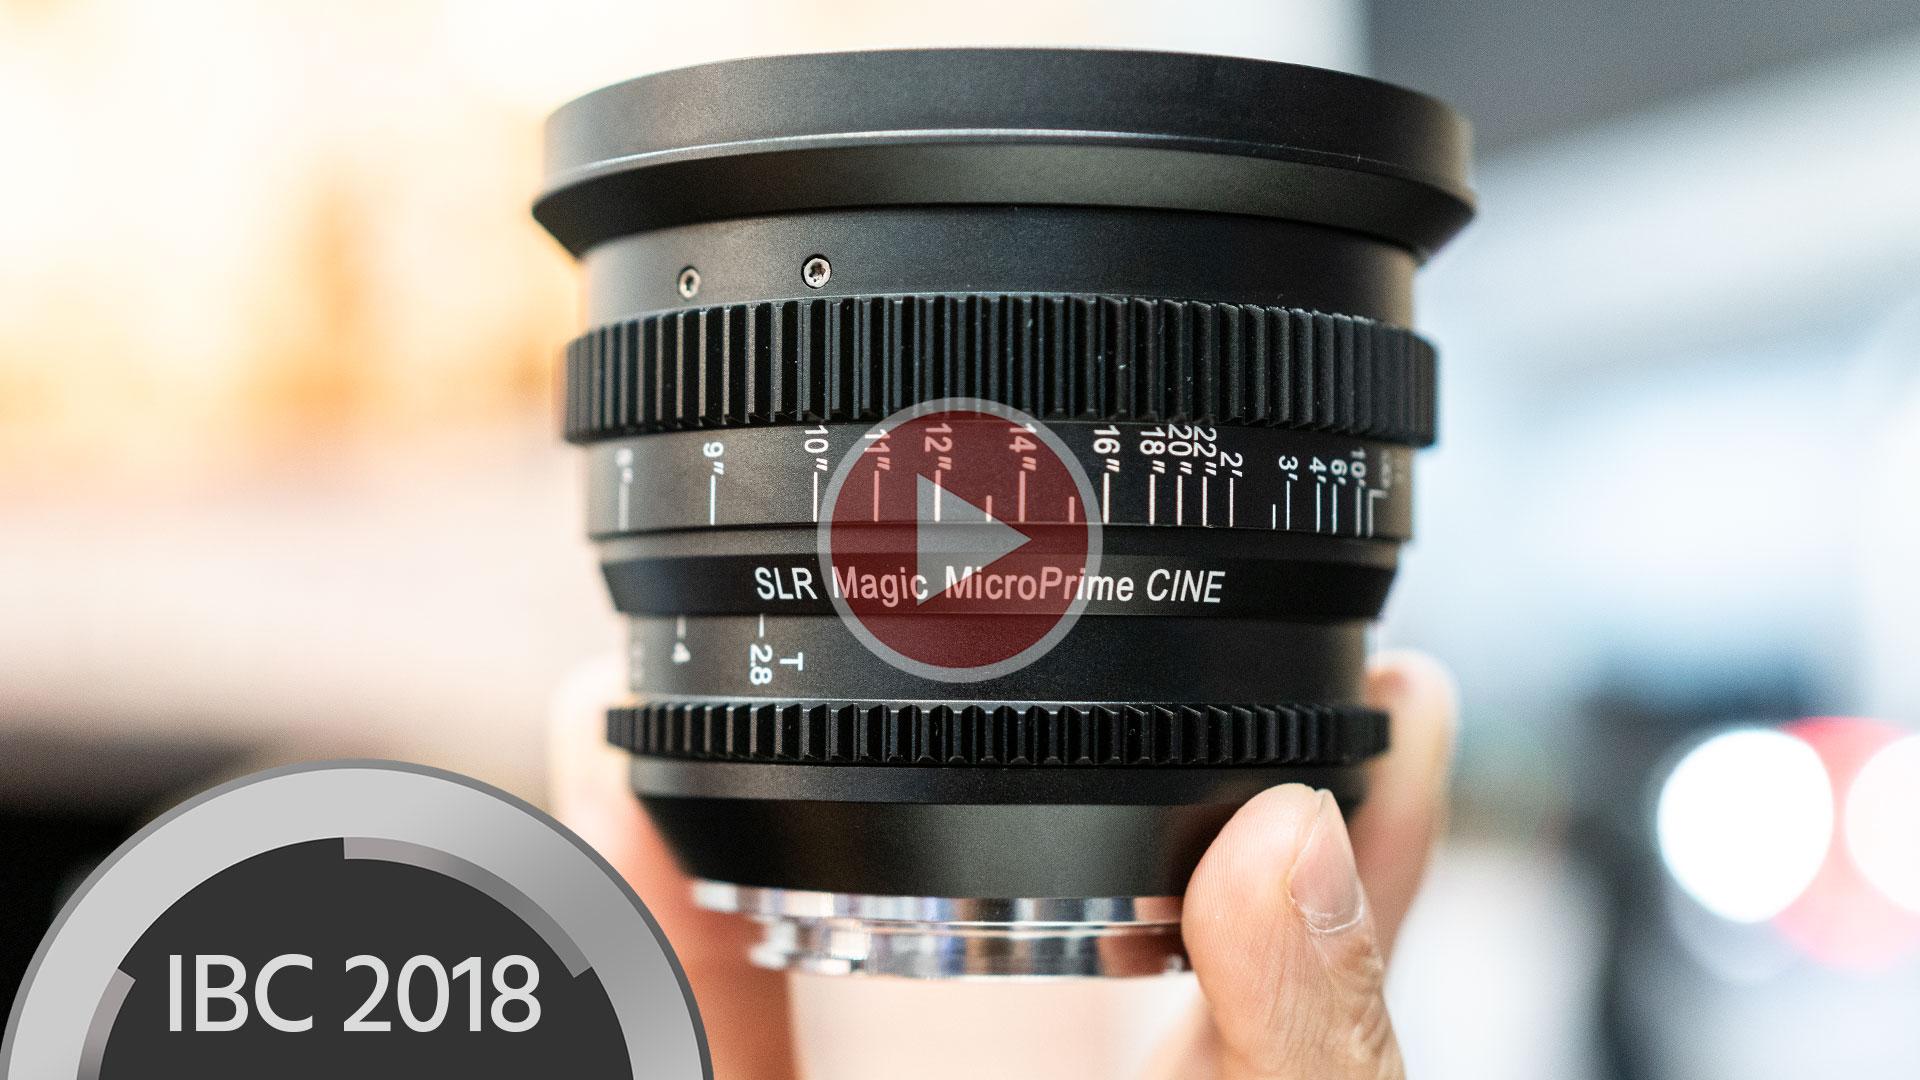 SLR Magic MicroPrime CINE 18mm T/2.8 – Lente Full Frame Ultra-Angular Para Montura E